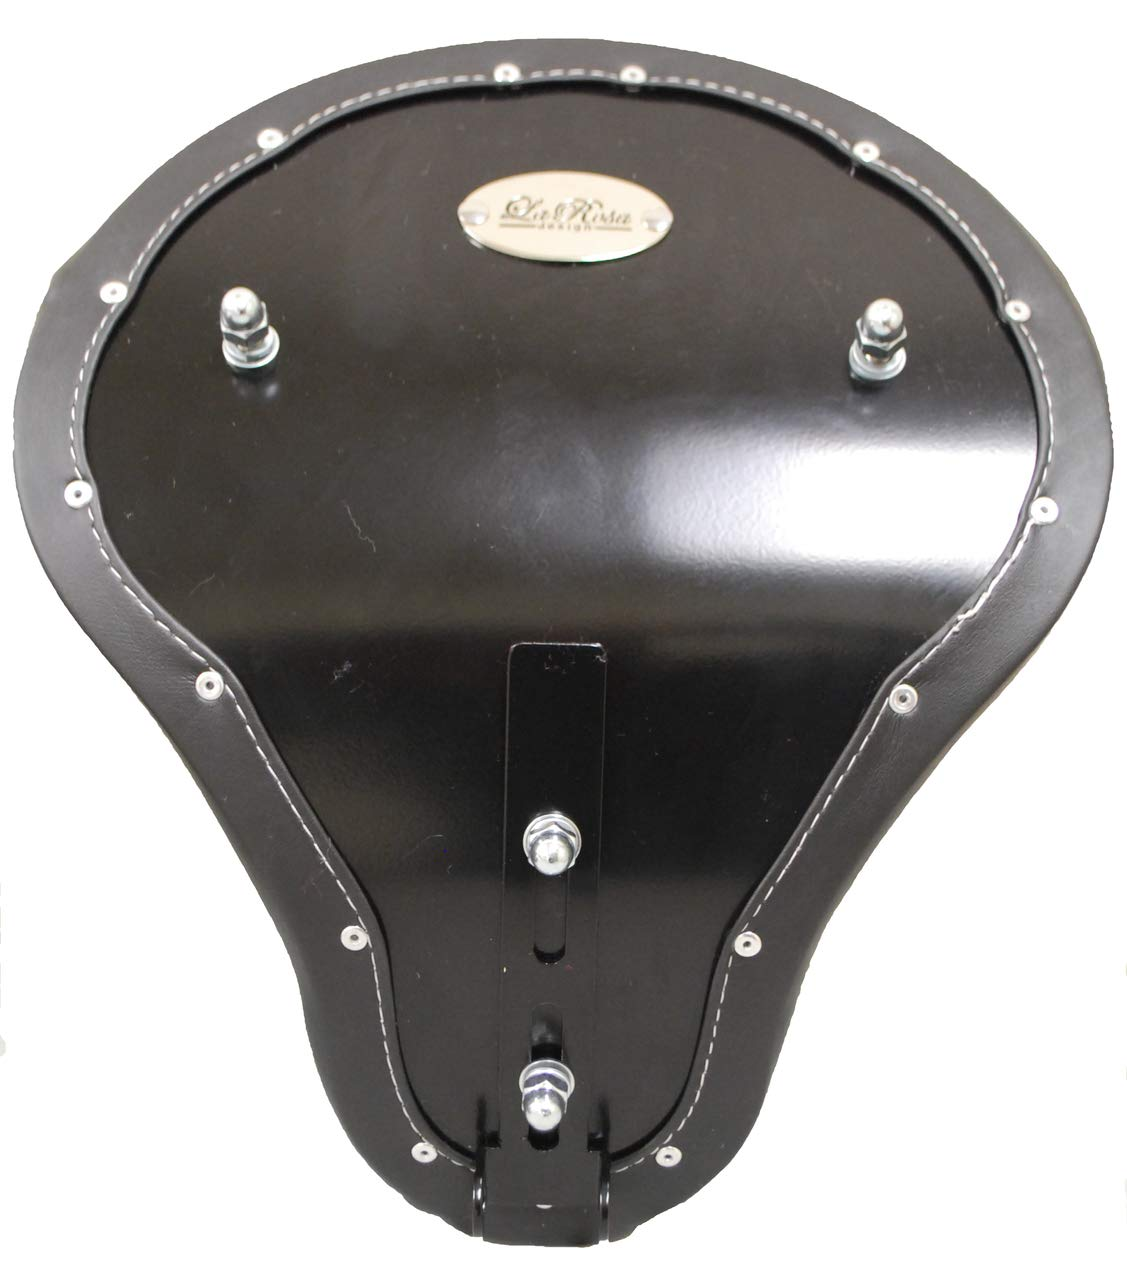 La Rosa Harley-Davidson Chopper Bobber 16 Eliminator Solo Seats Black with White Thread Diamond Tuk